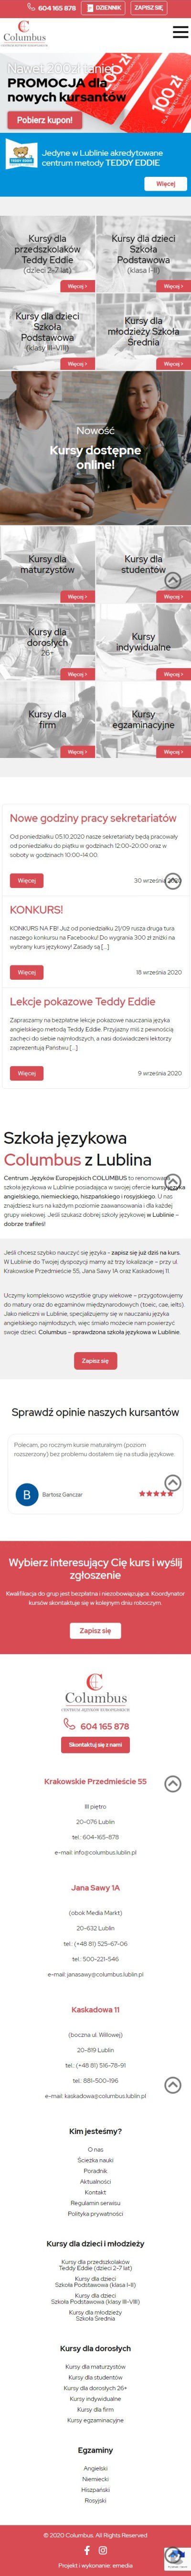 Strona internetowa columbus.lublin.pl - zrzut mobile